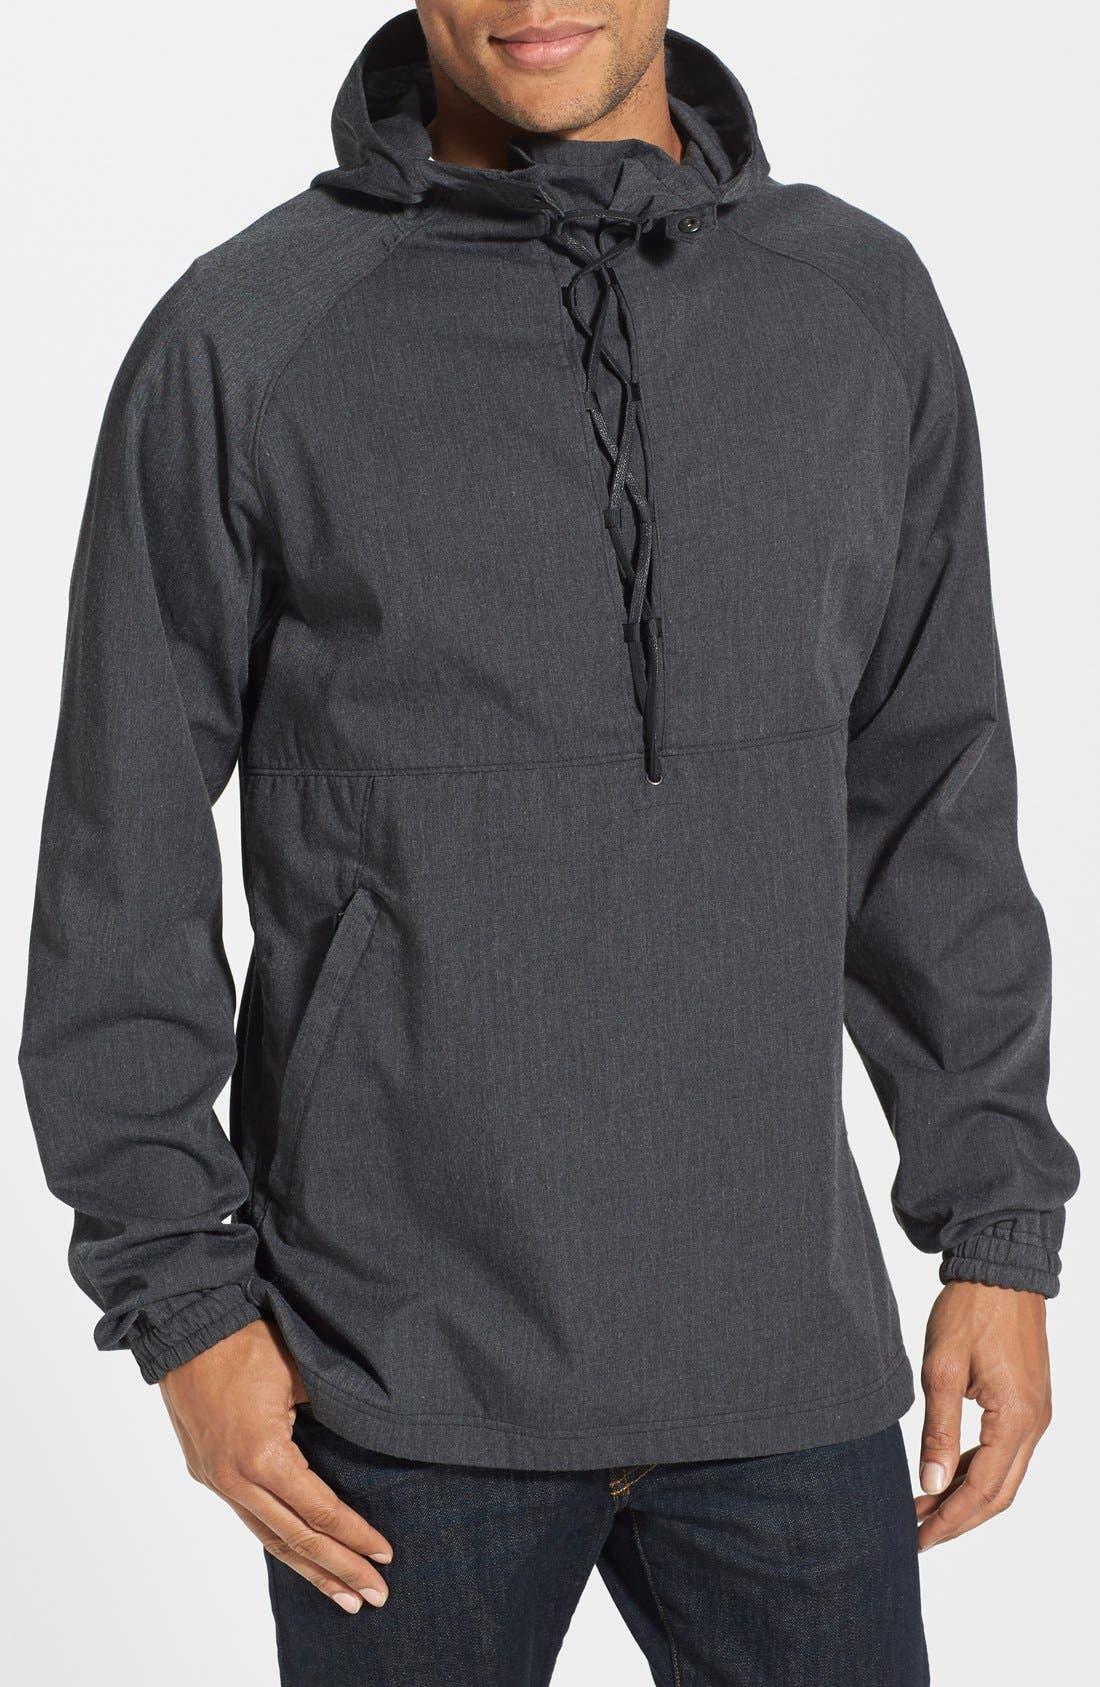 Alternate Image 1 Selected - Nau 'Popu' Organic Cotton Blend Lace Up Coat